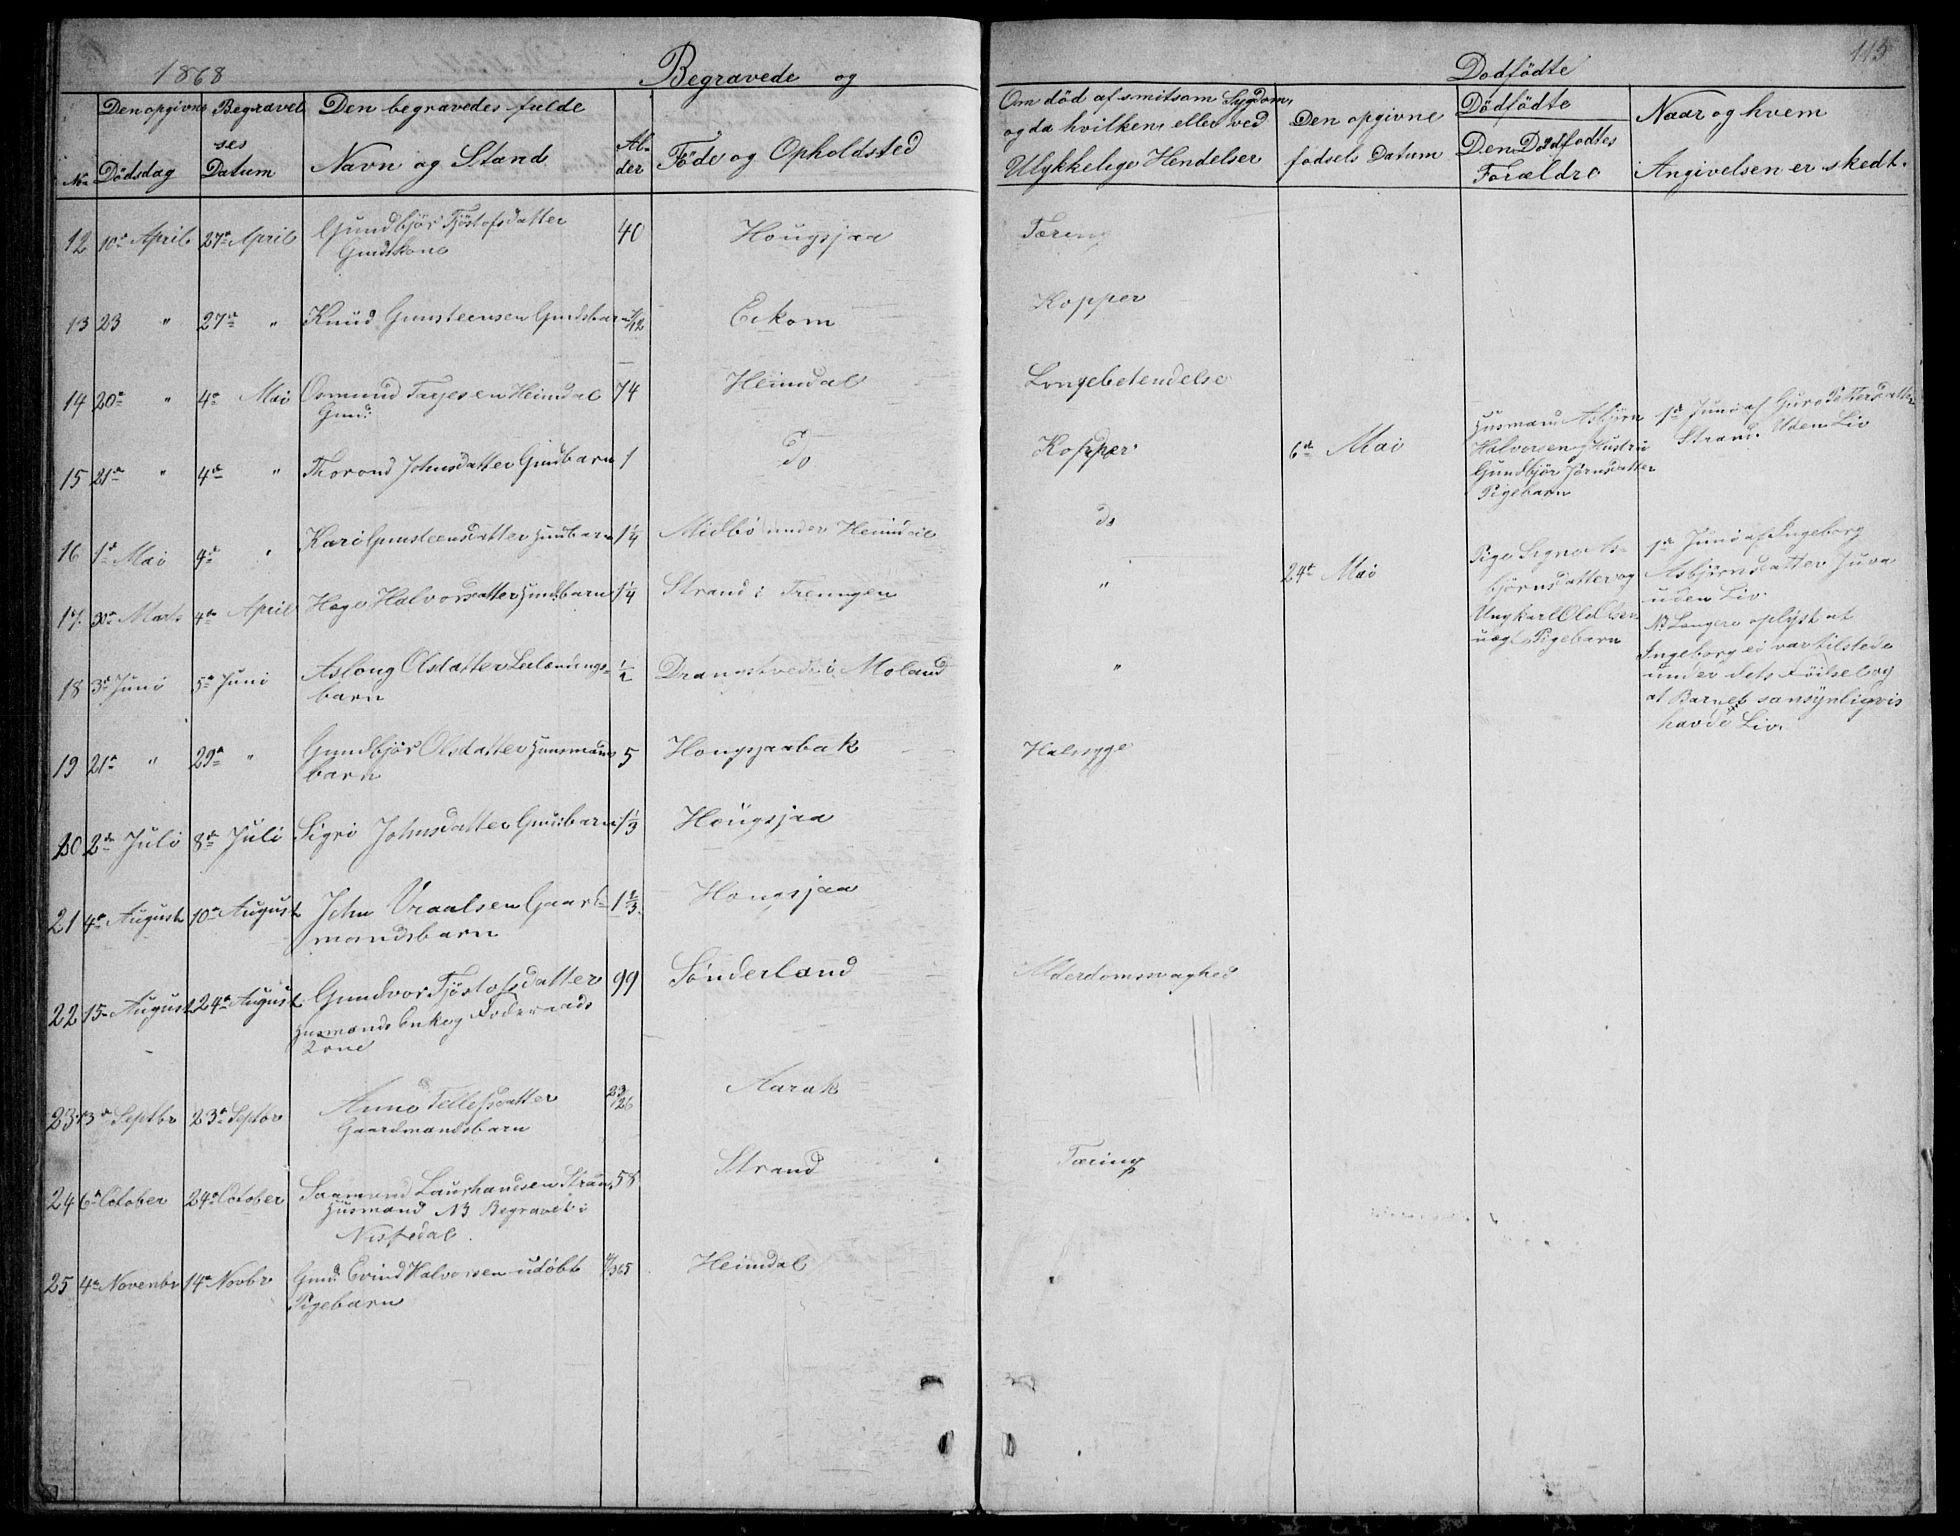 SAKO, Nissedal kirkebøker, G/Gb/L0002: Klokkerbok nr. II 2, 1863-1892, s. 115